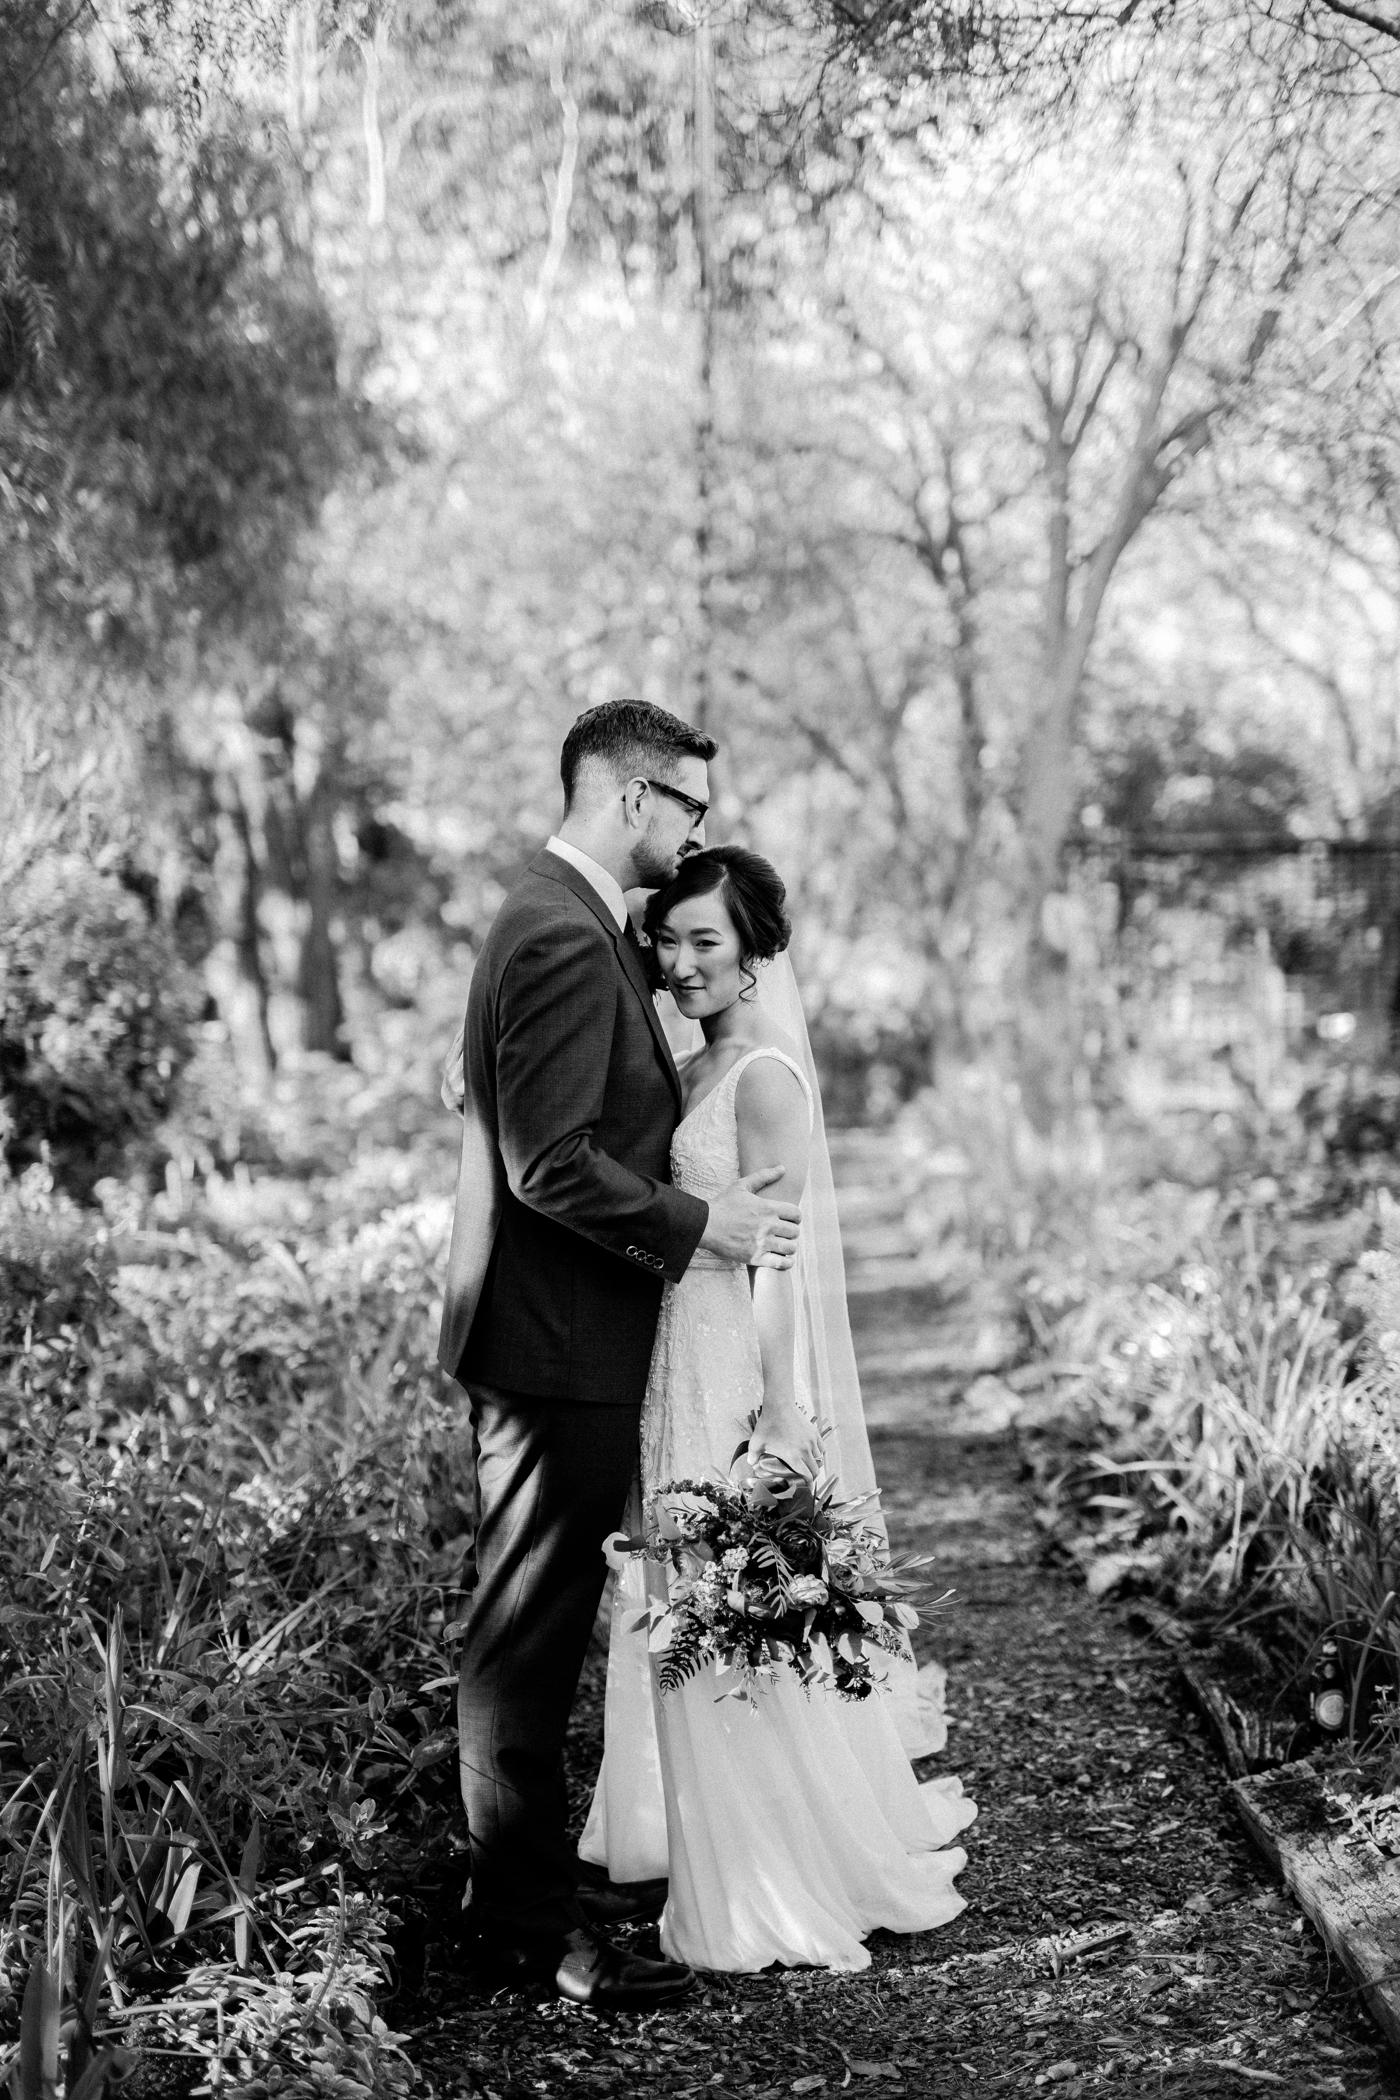 Adelaide Wedding Photographer - Al Ru Farm Wedding in Adelaide - Natural Wedding Photography Australia - www.katherineschultzphotography.com - Todd & Rachel 1